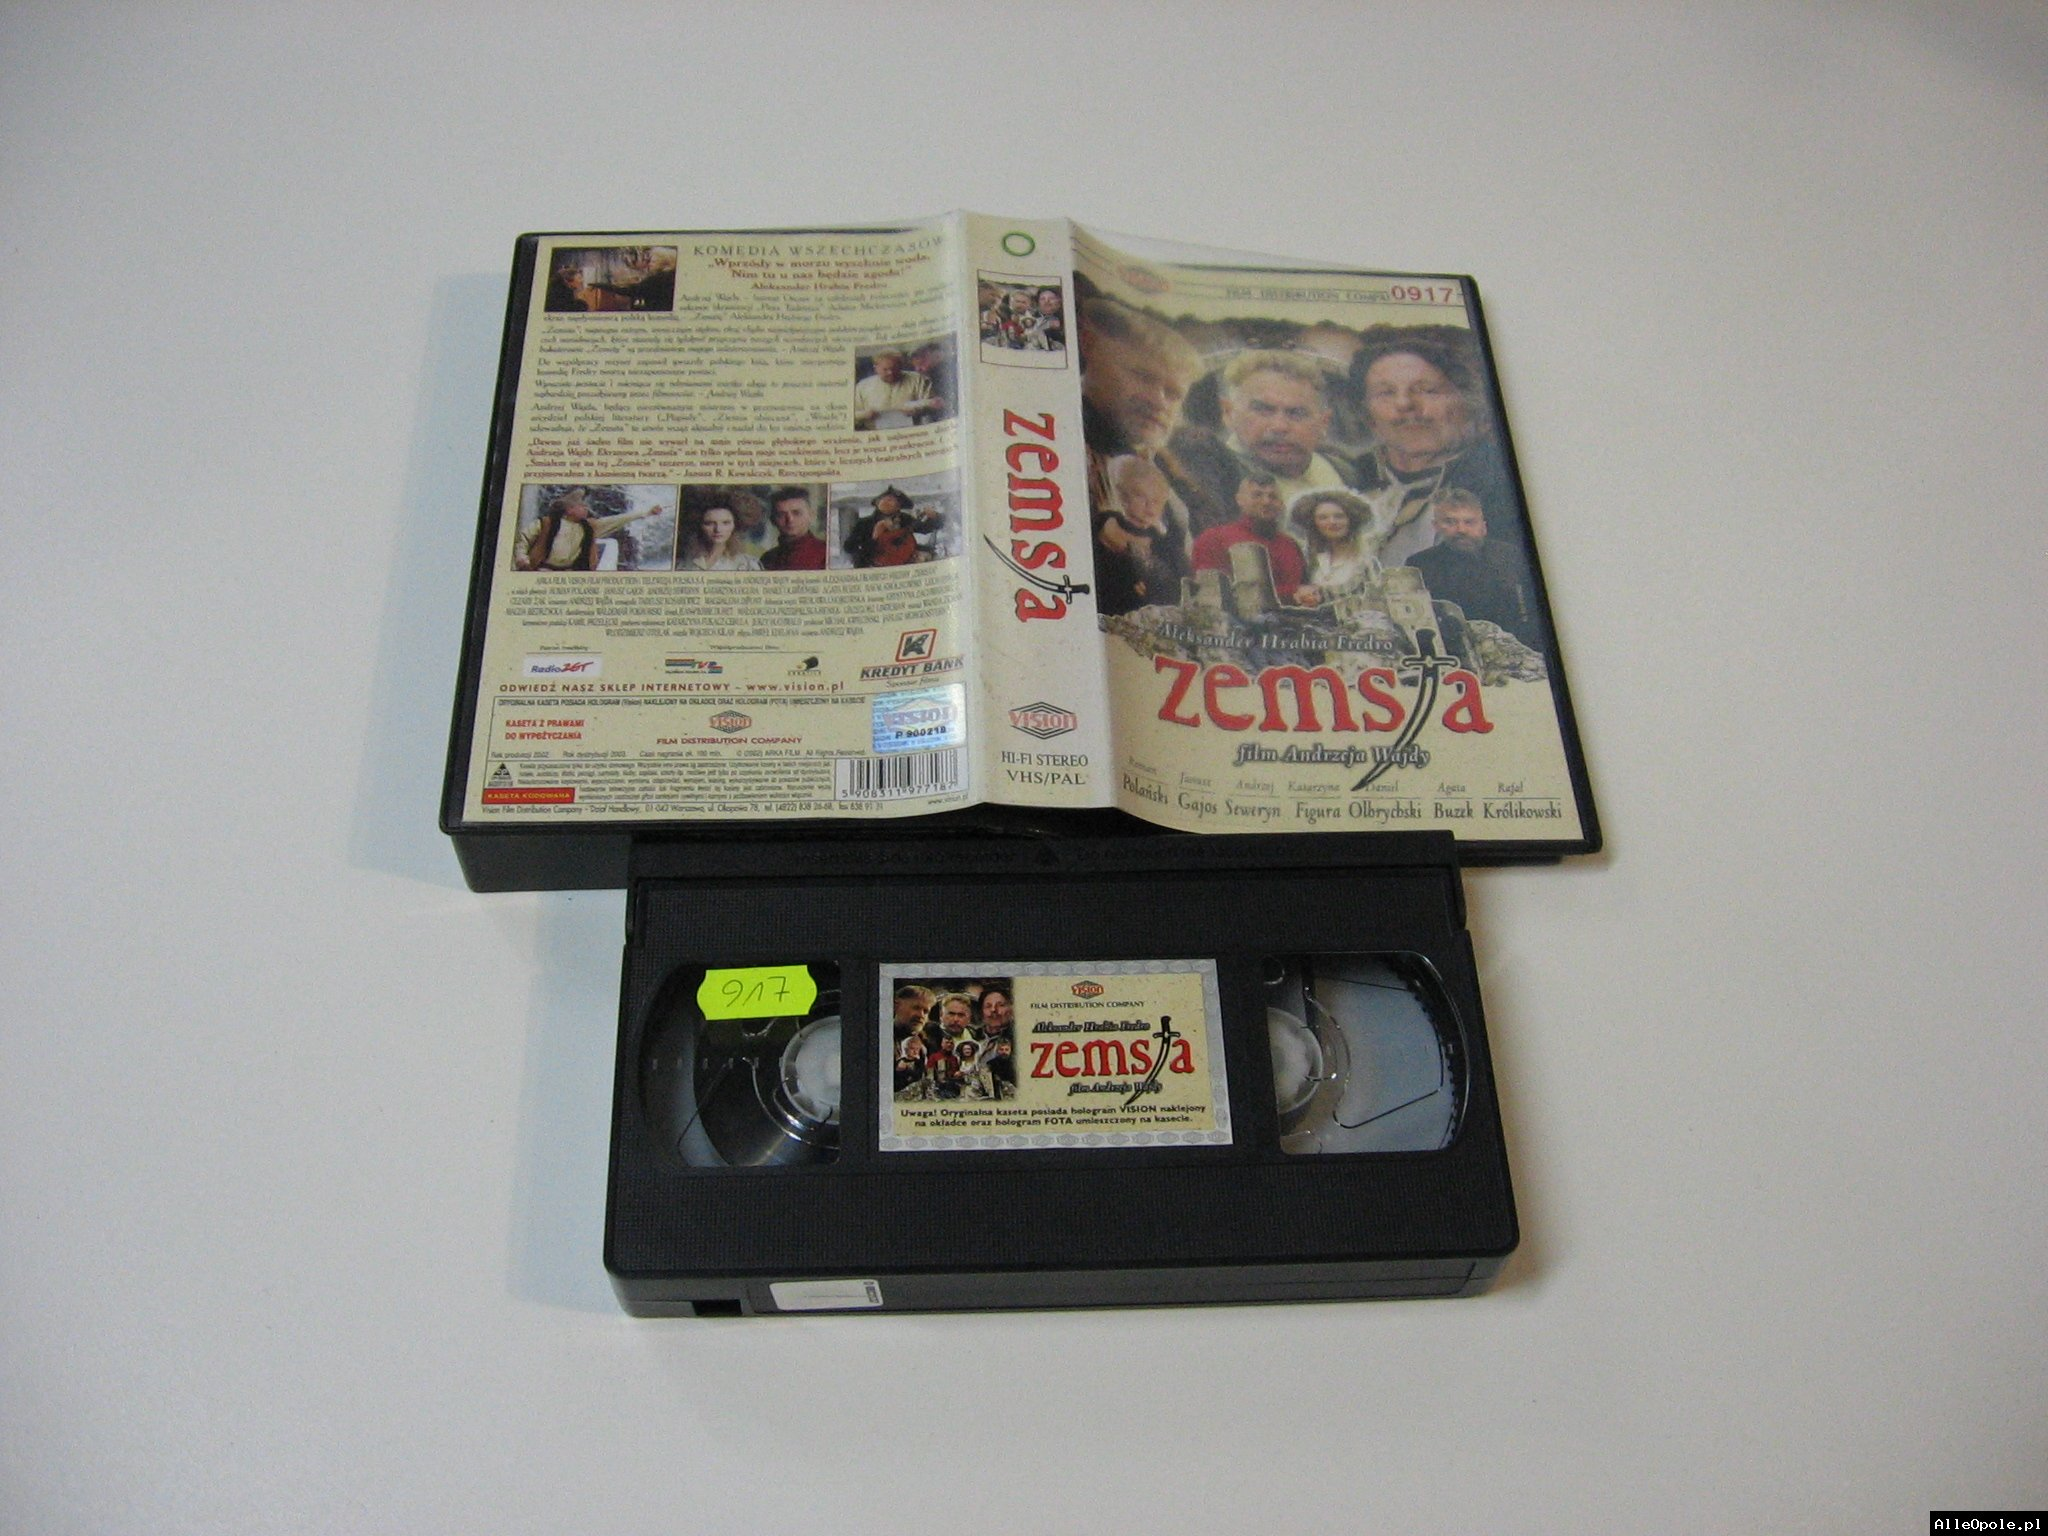 ZEMSTA - ANDRZEJ WAJDA - VHS Kaseta Video - Opole 1770